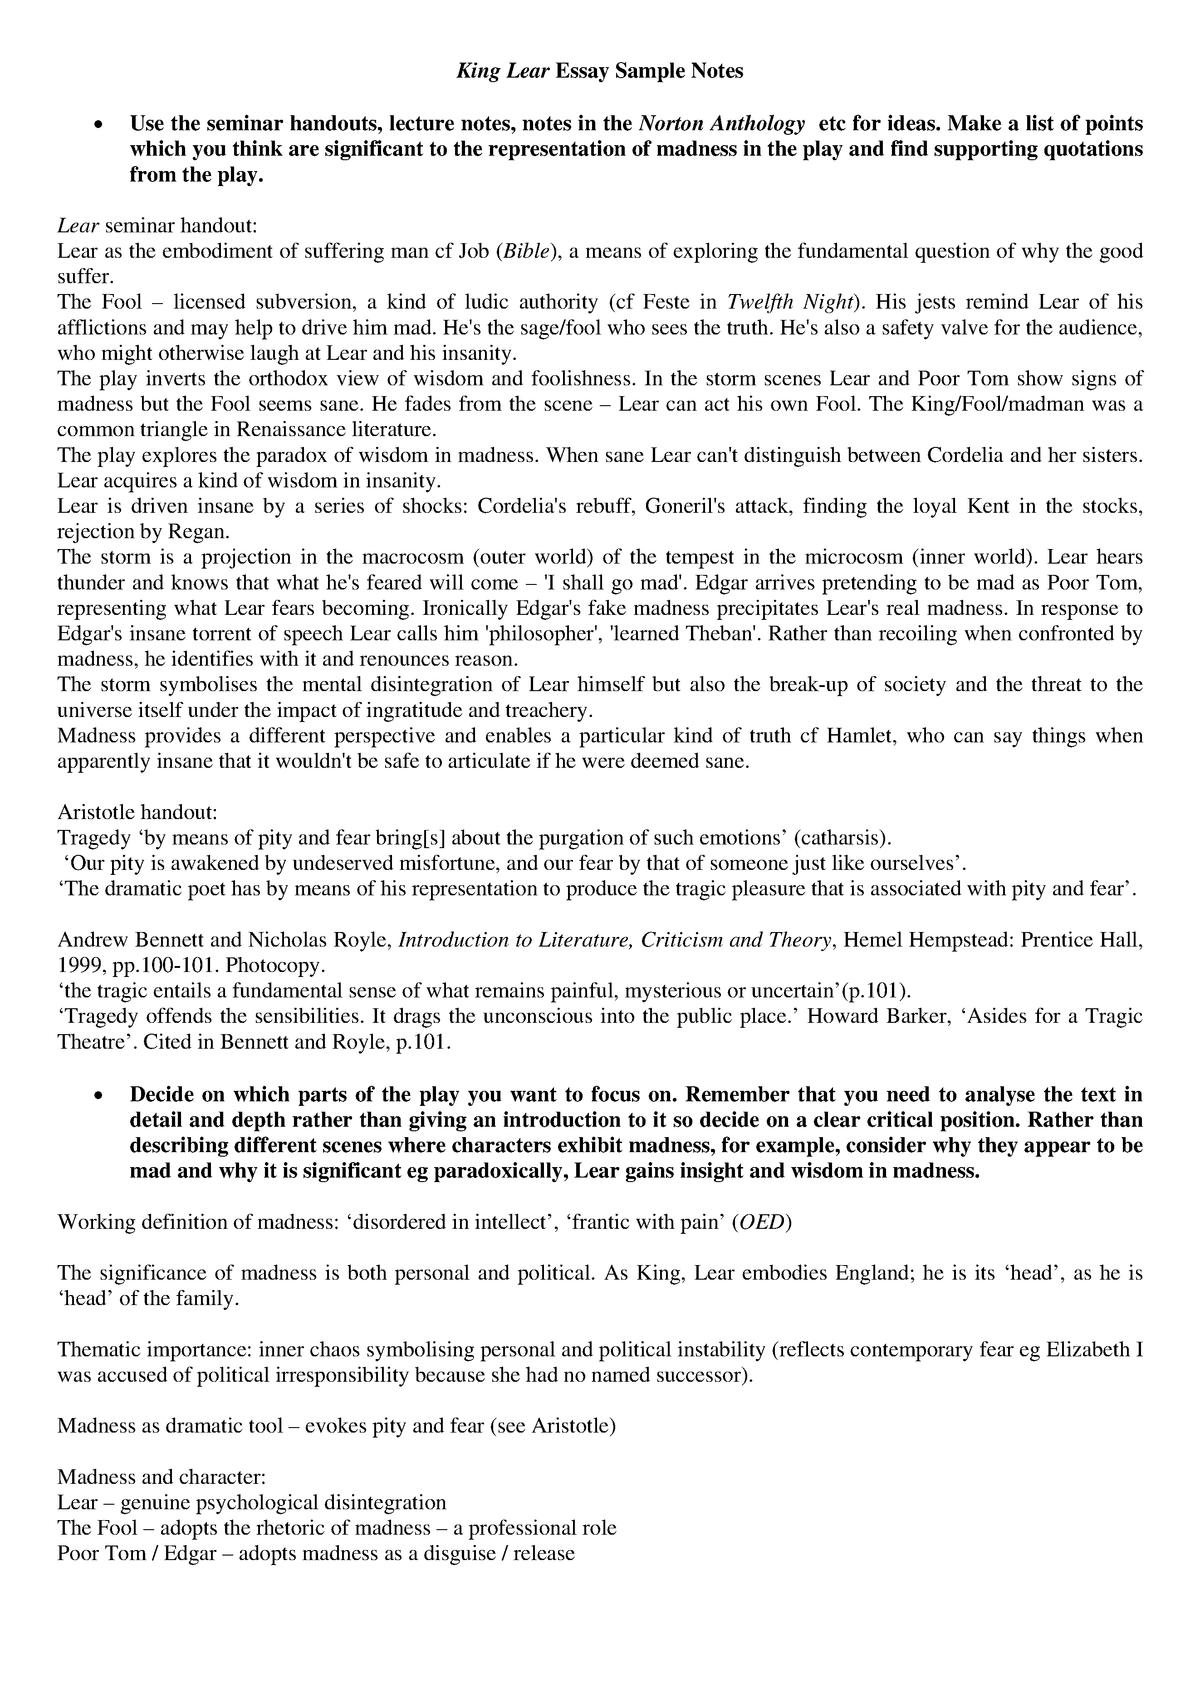 Cheap argumentative essay editing website for university